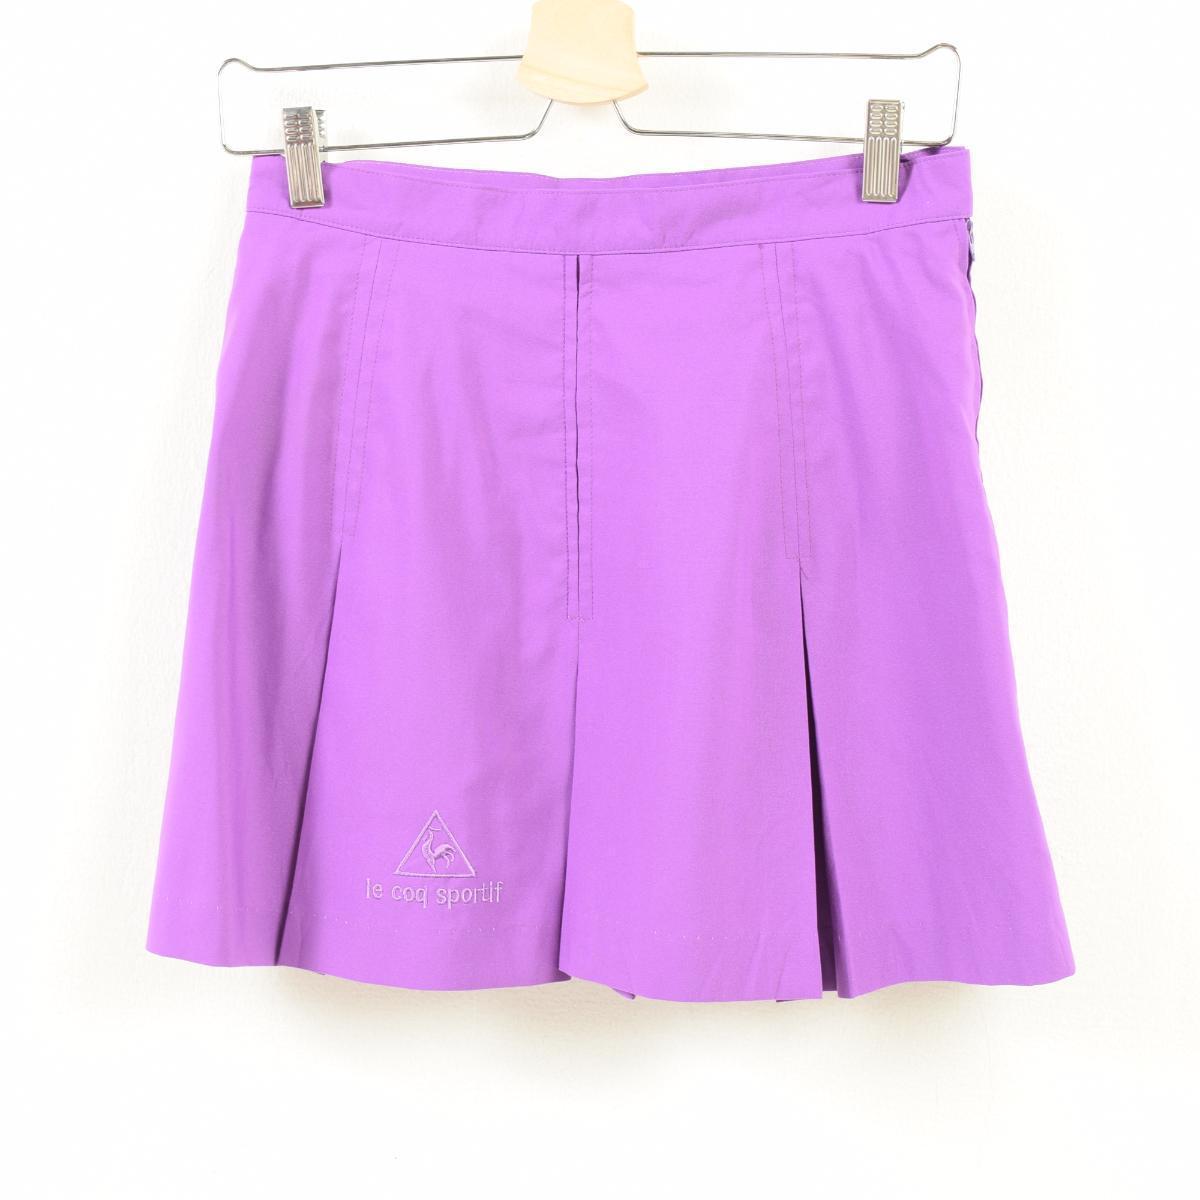 0ef8e6d4cccd Lady s L  was5400 made in Le Coq Sportif le coq sportif box pleat miniskirt  tennis skirt USA